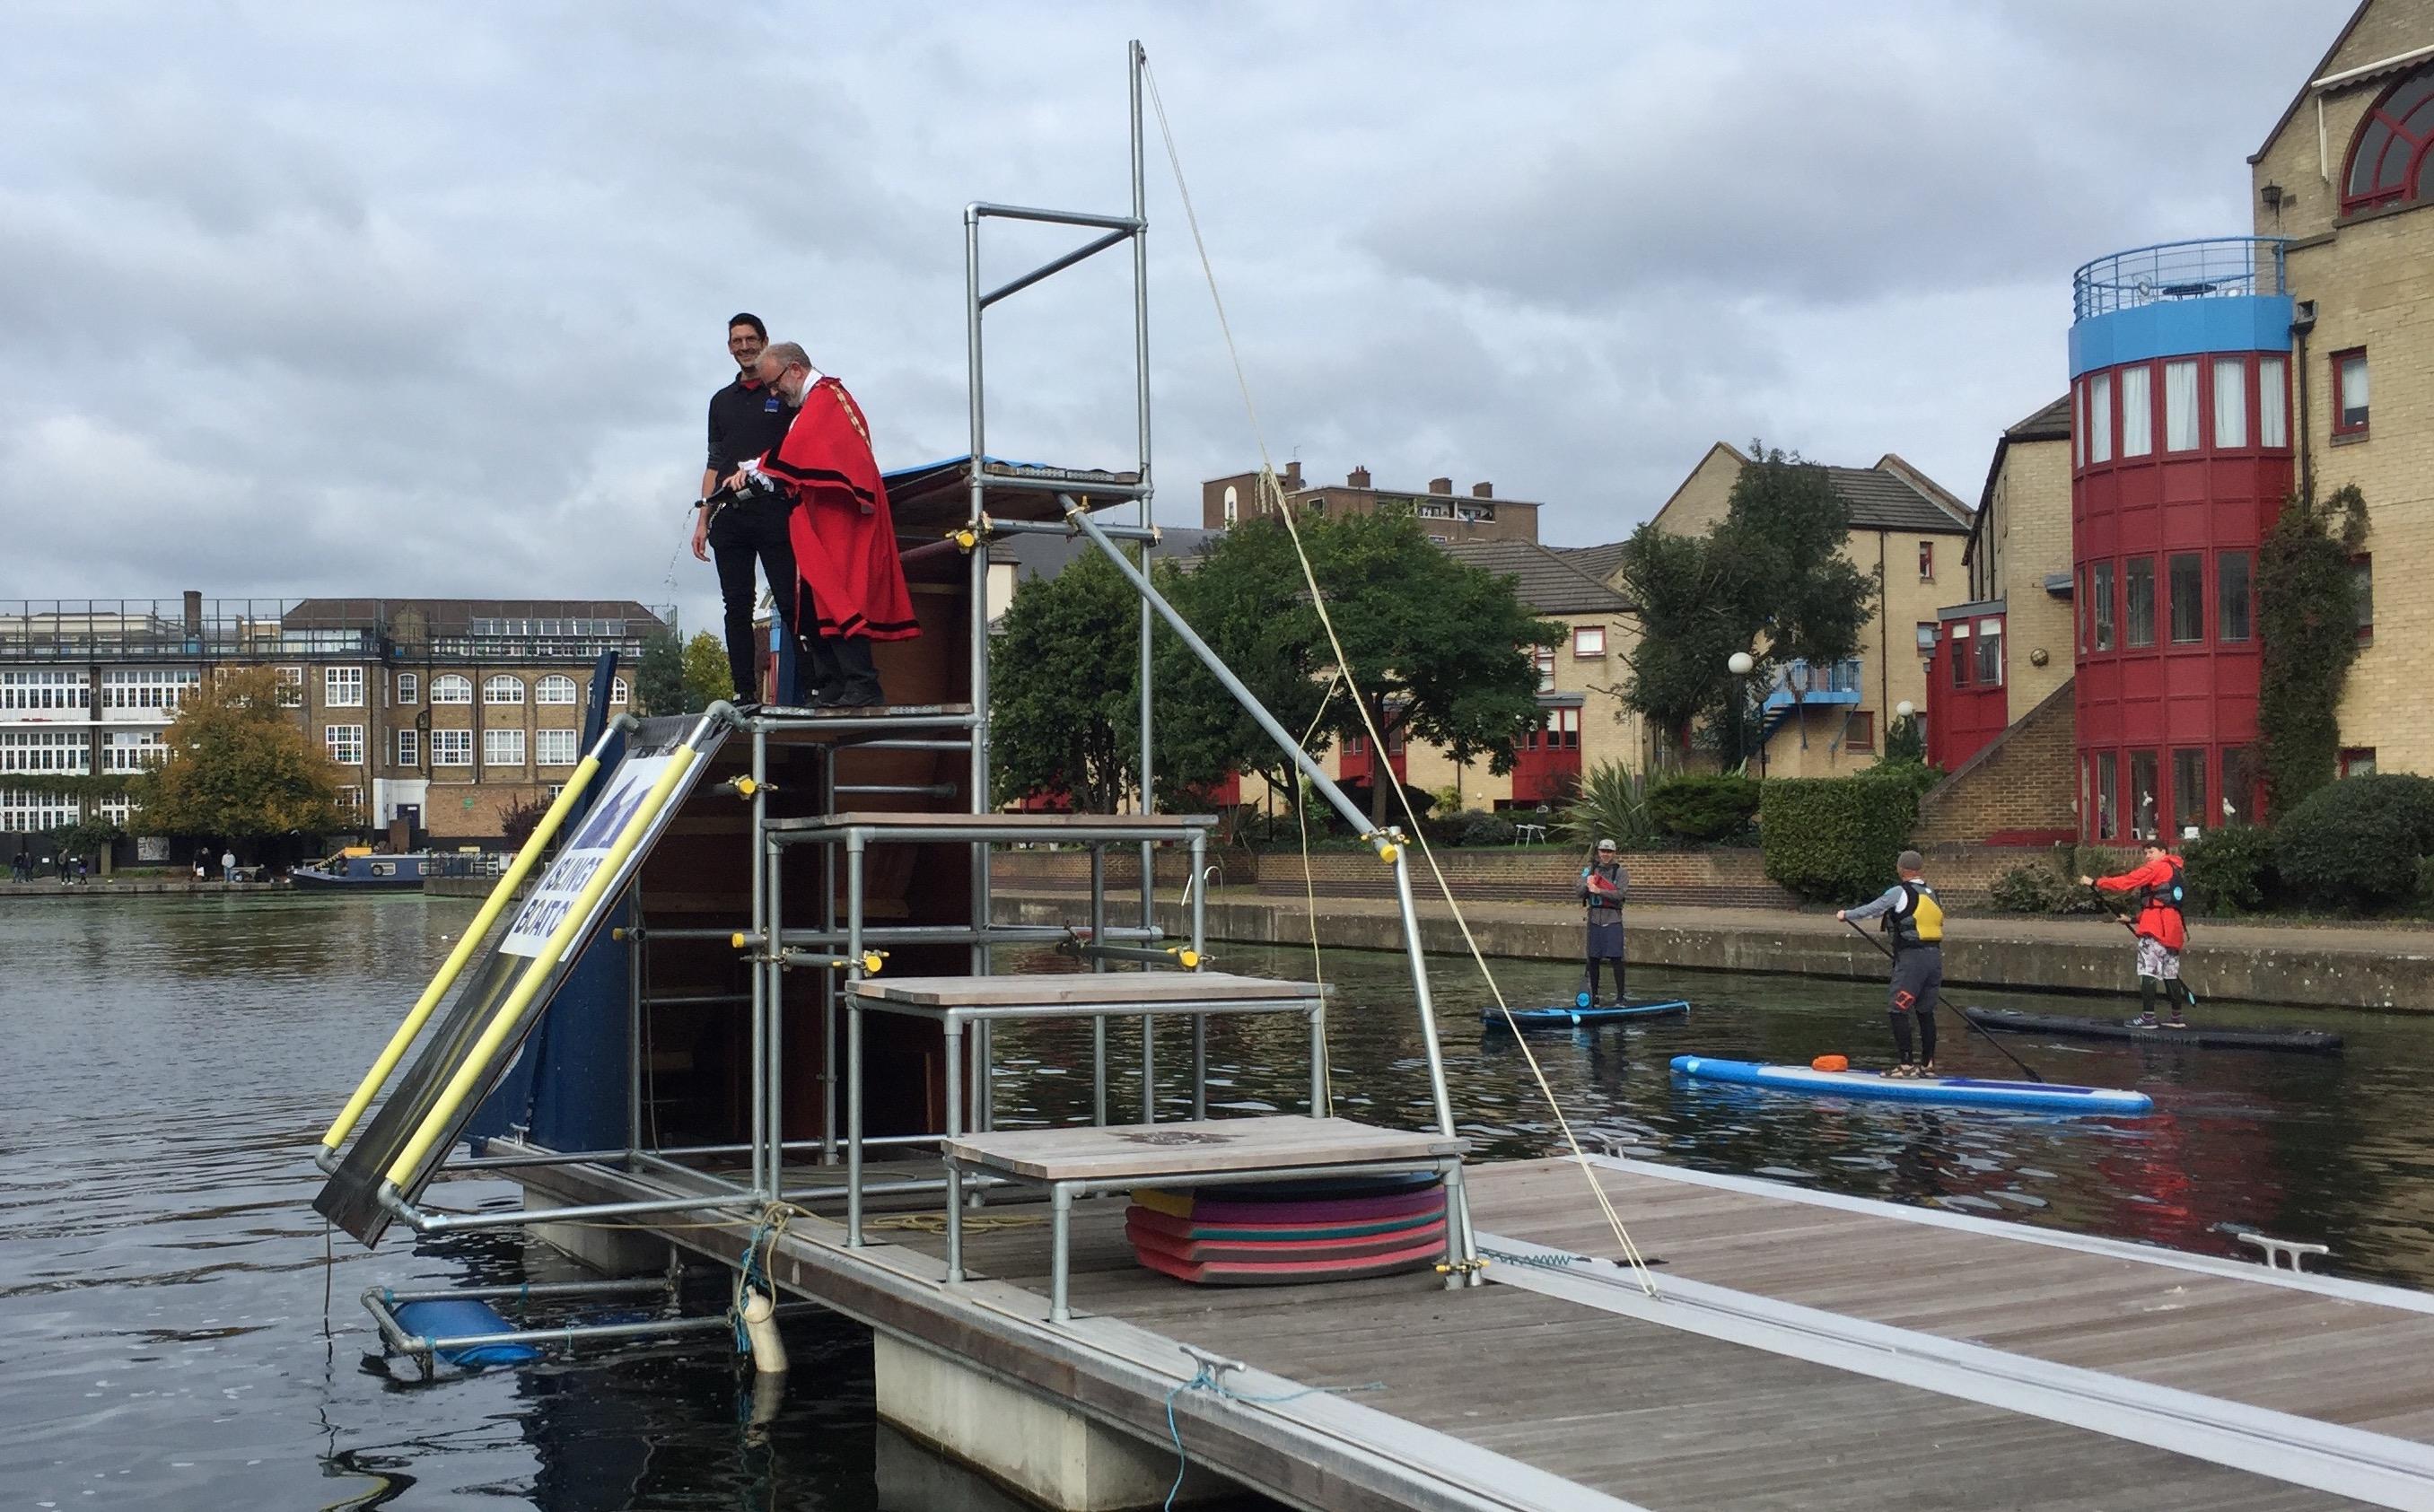 Mayor christening ramp